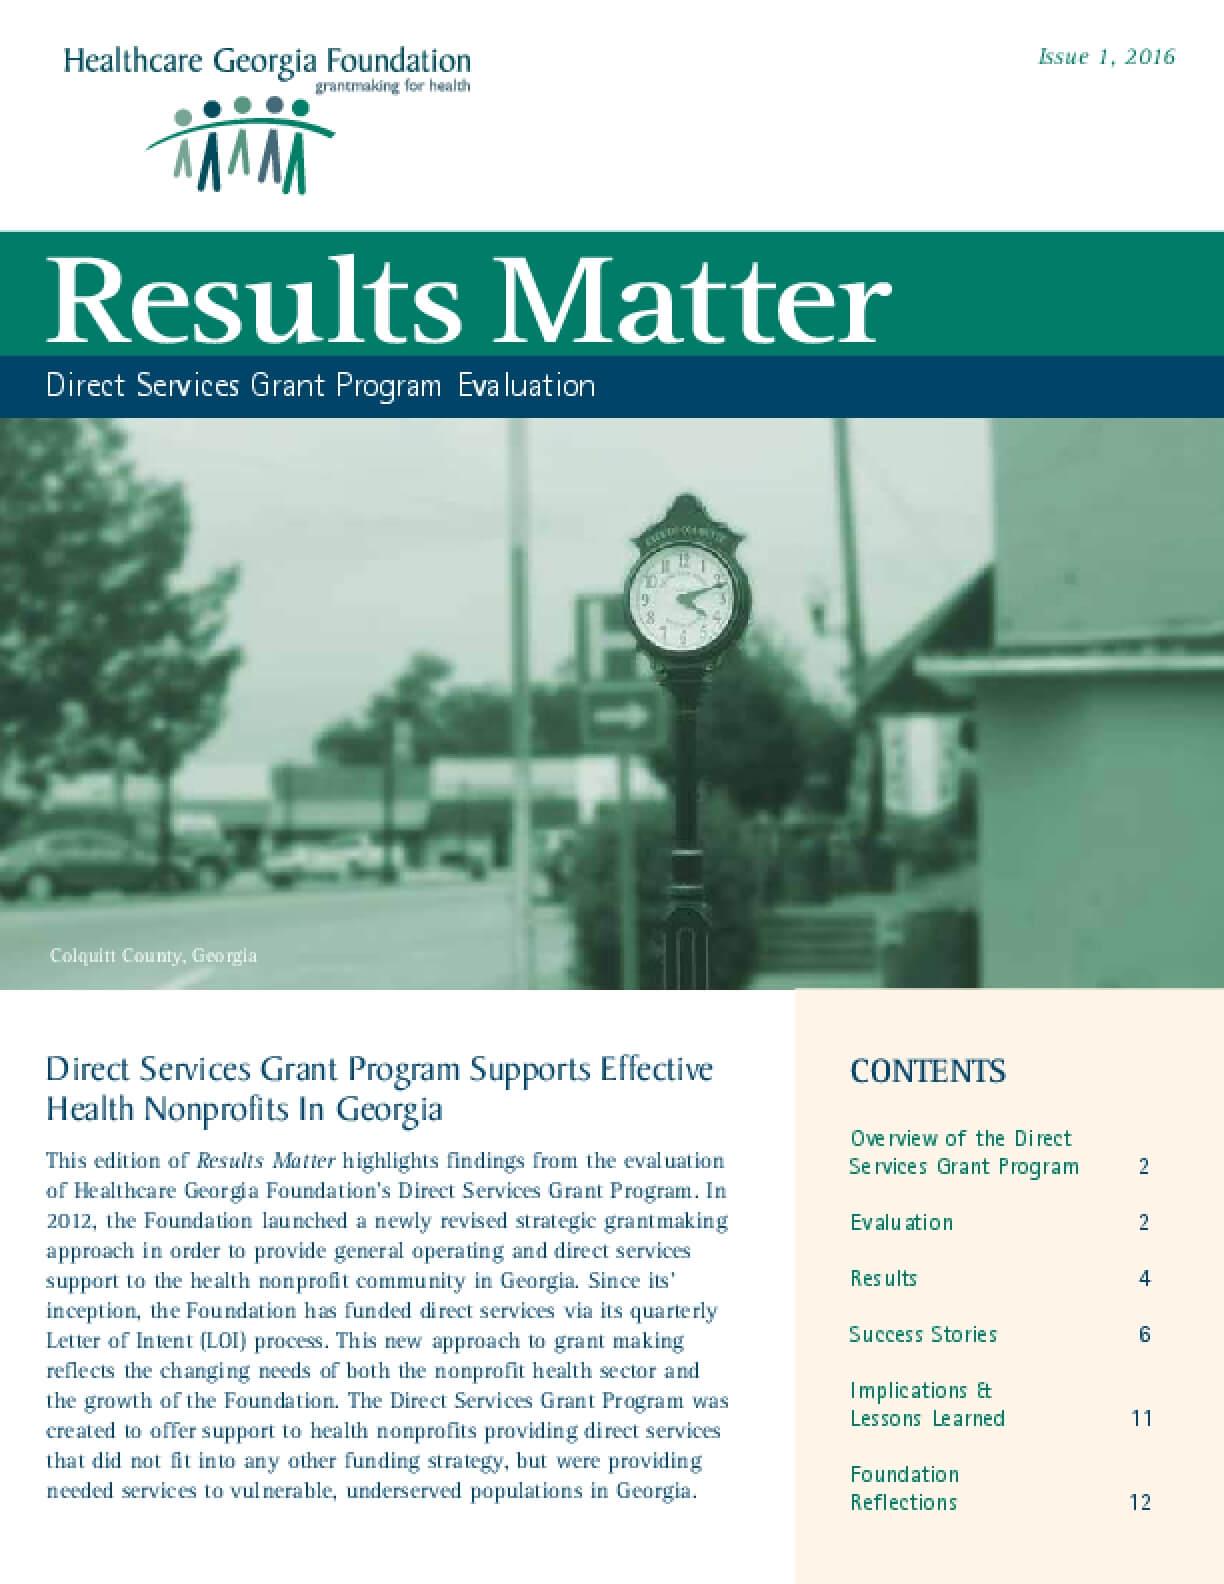 Results Matter: Direct Services Grants Program Evaluation